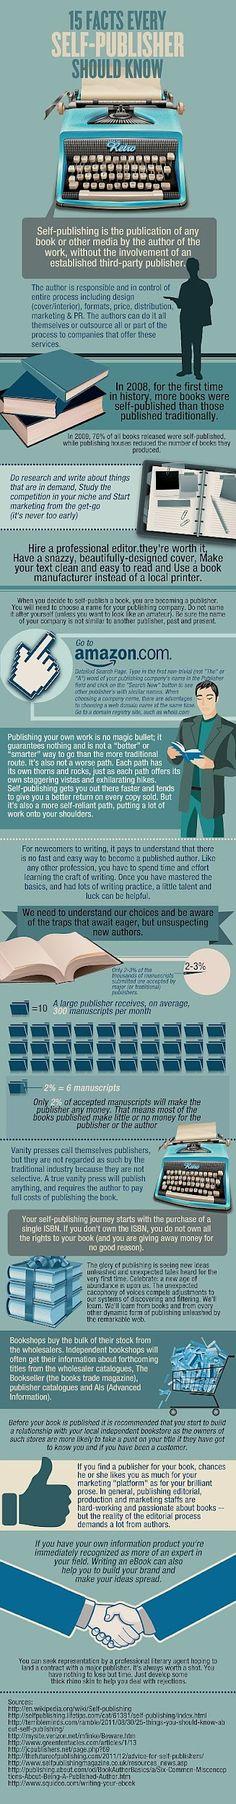 Interesting infographic about self publishing #self publishing #authors #writers.